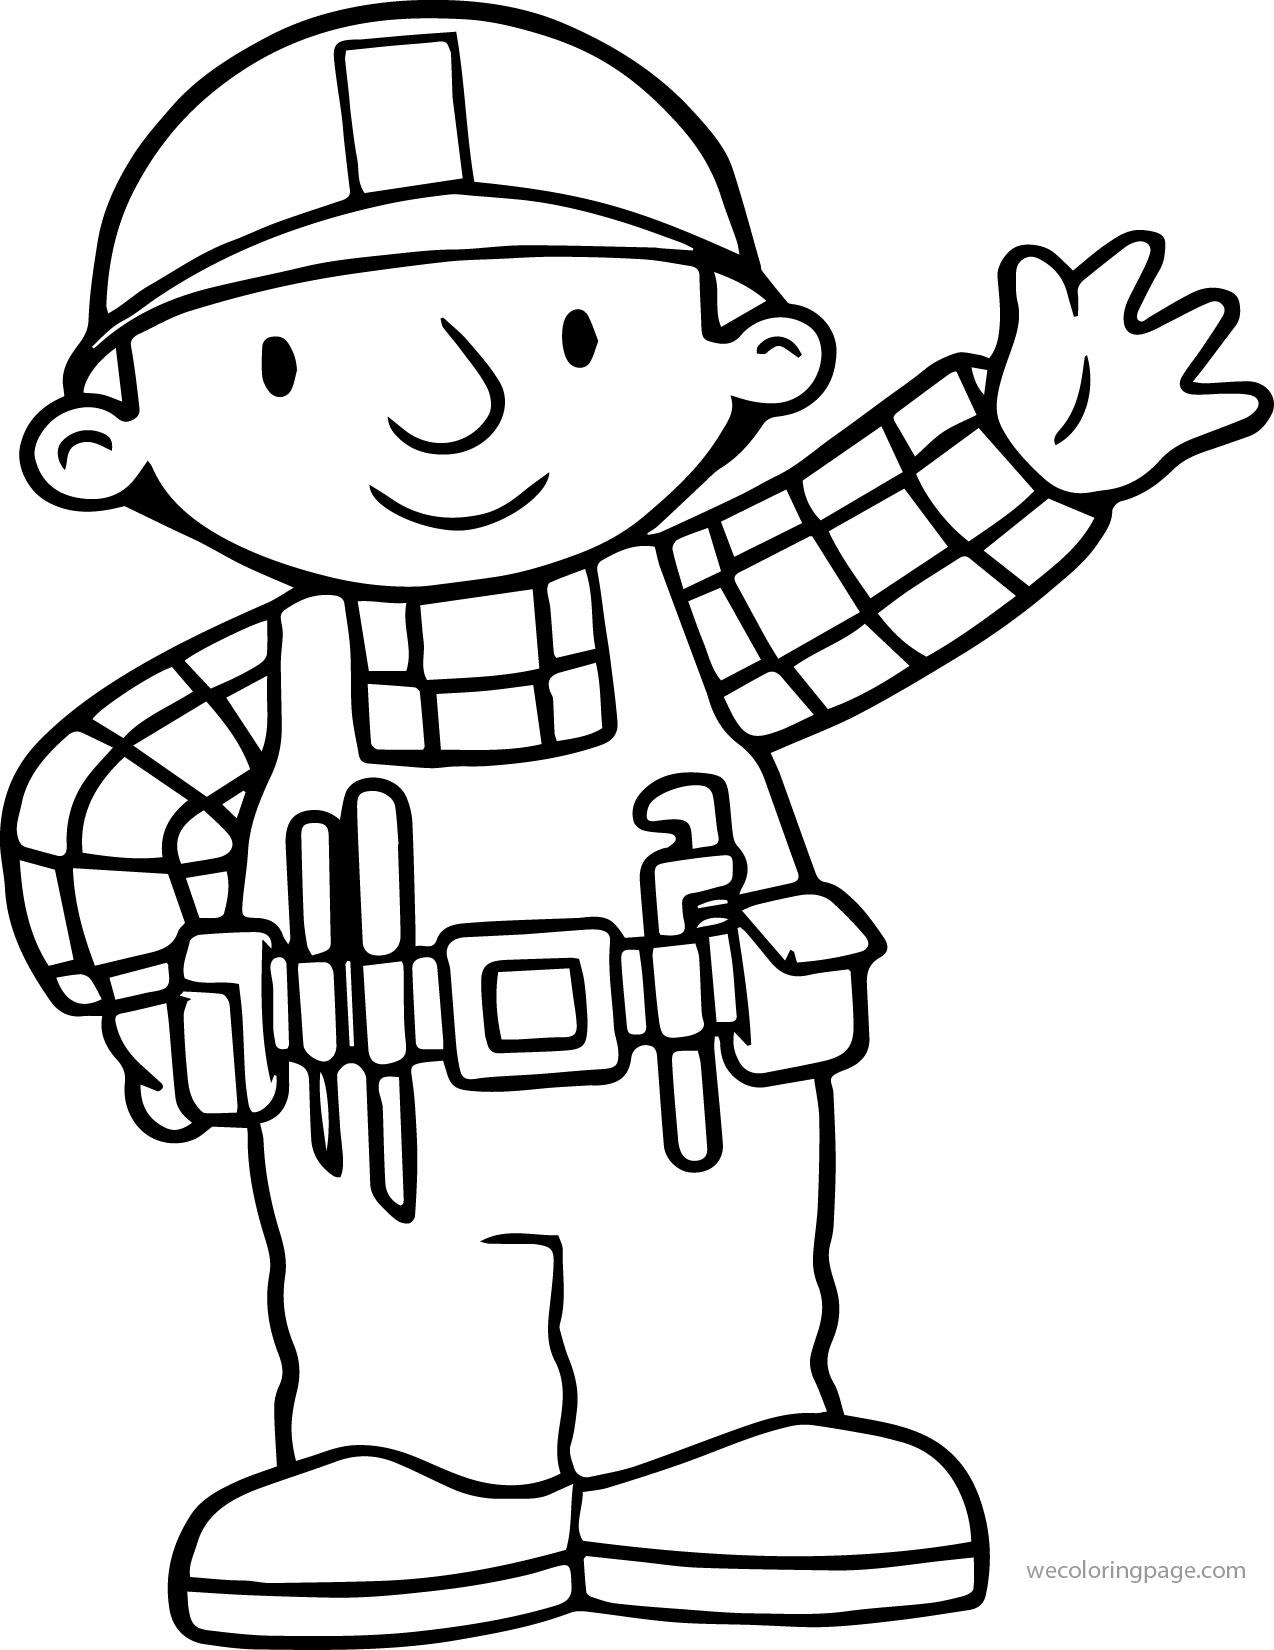 Bob The Builder Hi Coloring Page